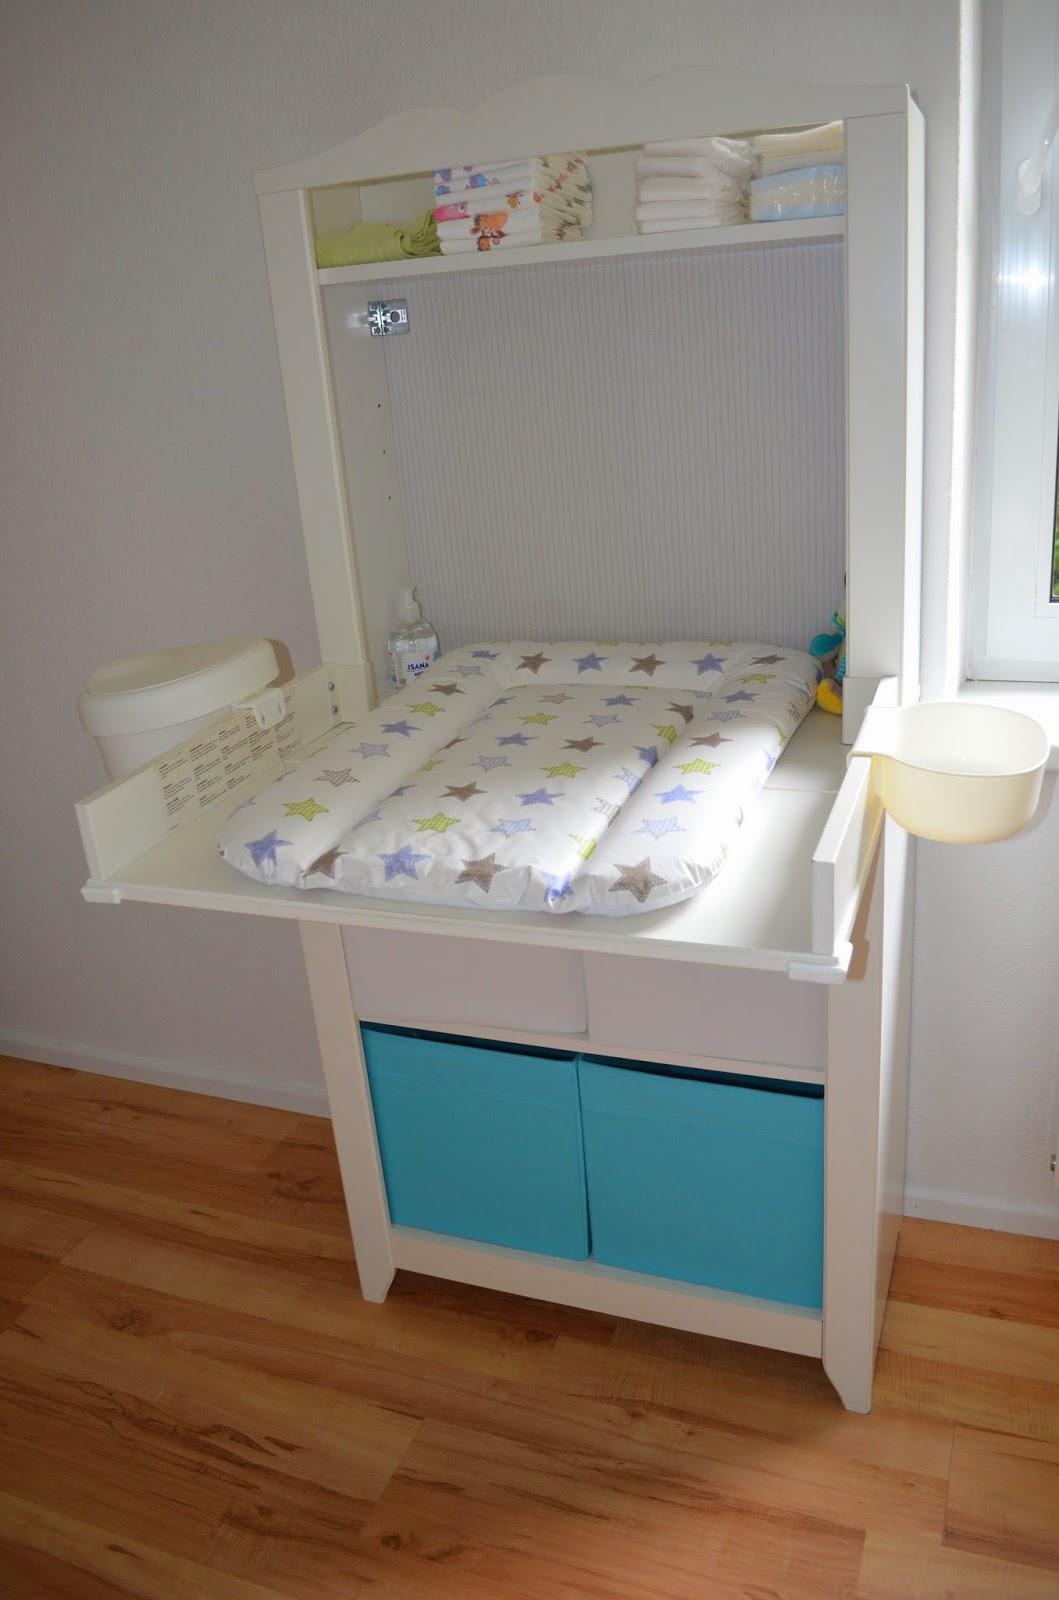 mami baby wickeltisch. Black Bedroom Furniture Sets. Home Design Ideas